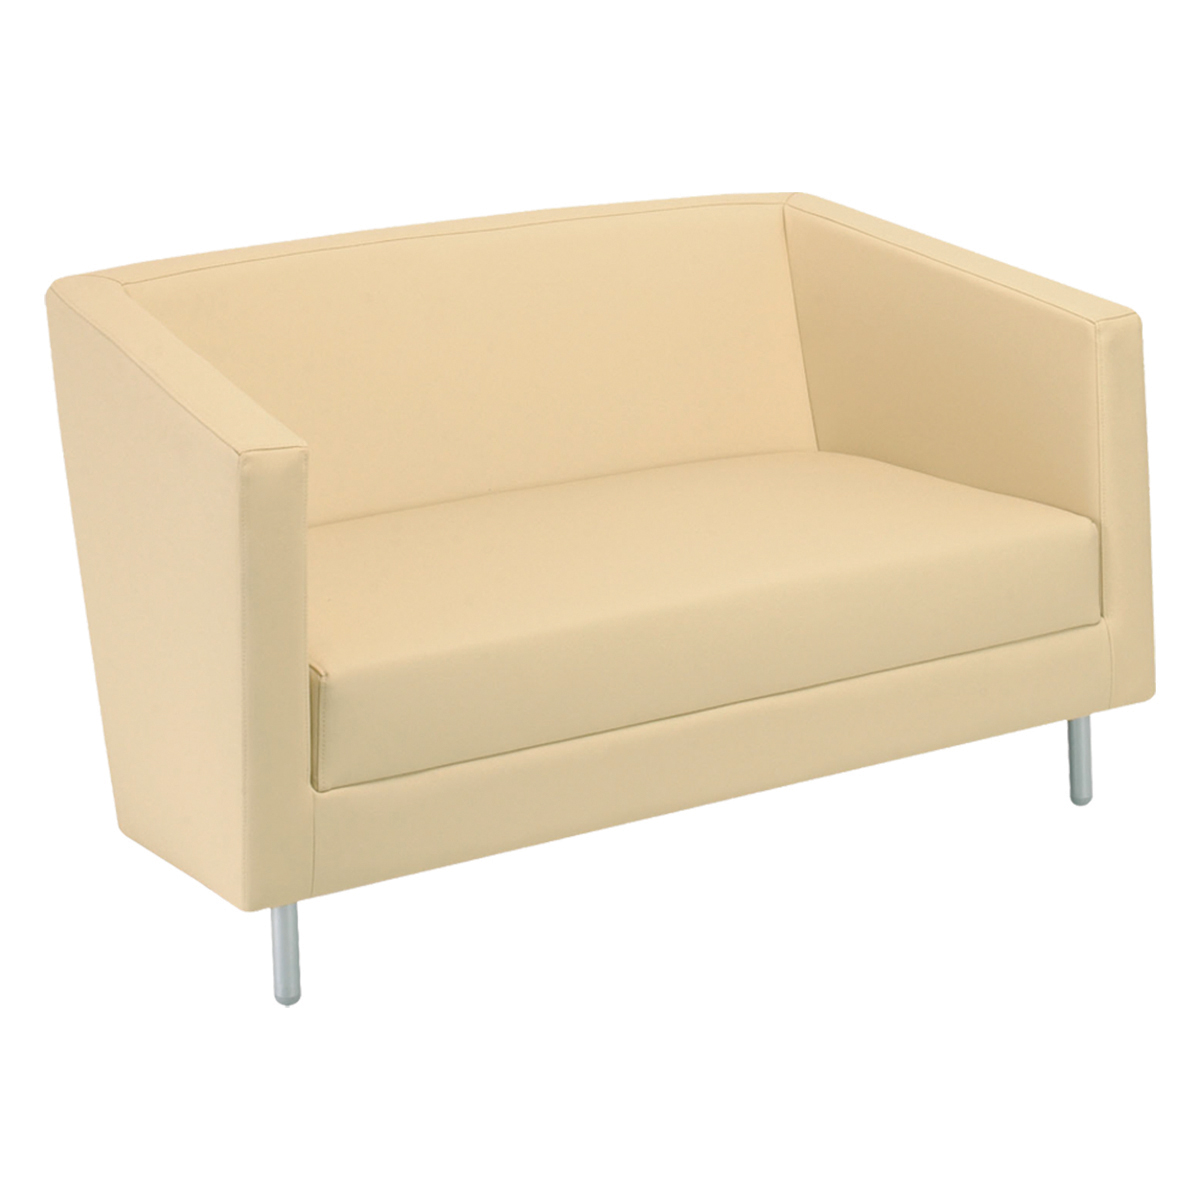 kool furniture. TAN KOOL SOFA Kool Furniture